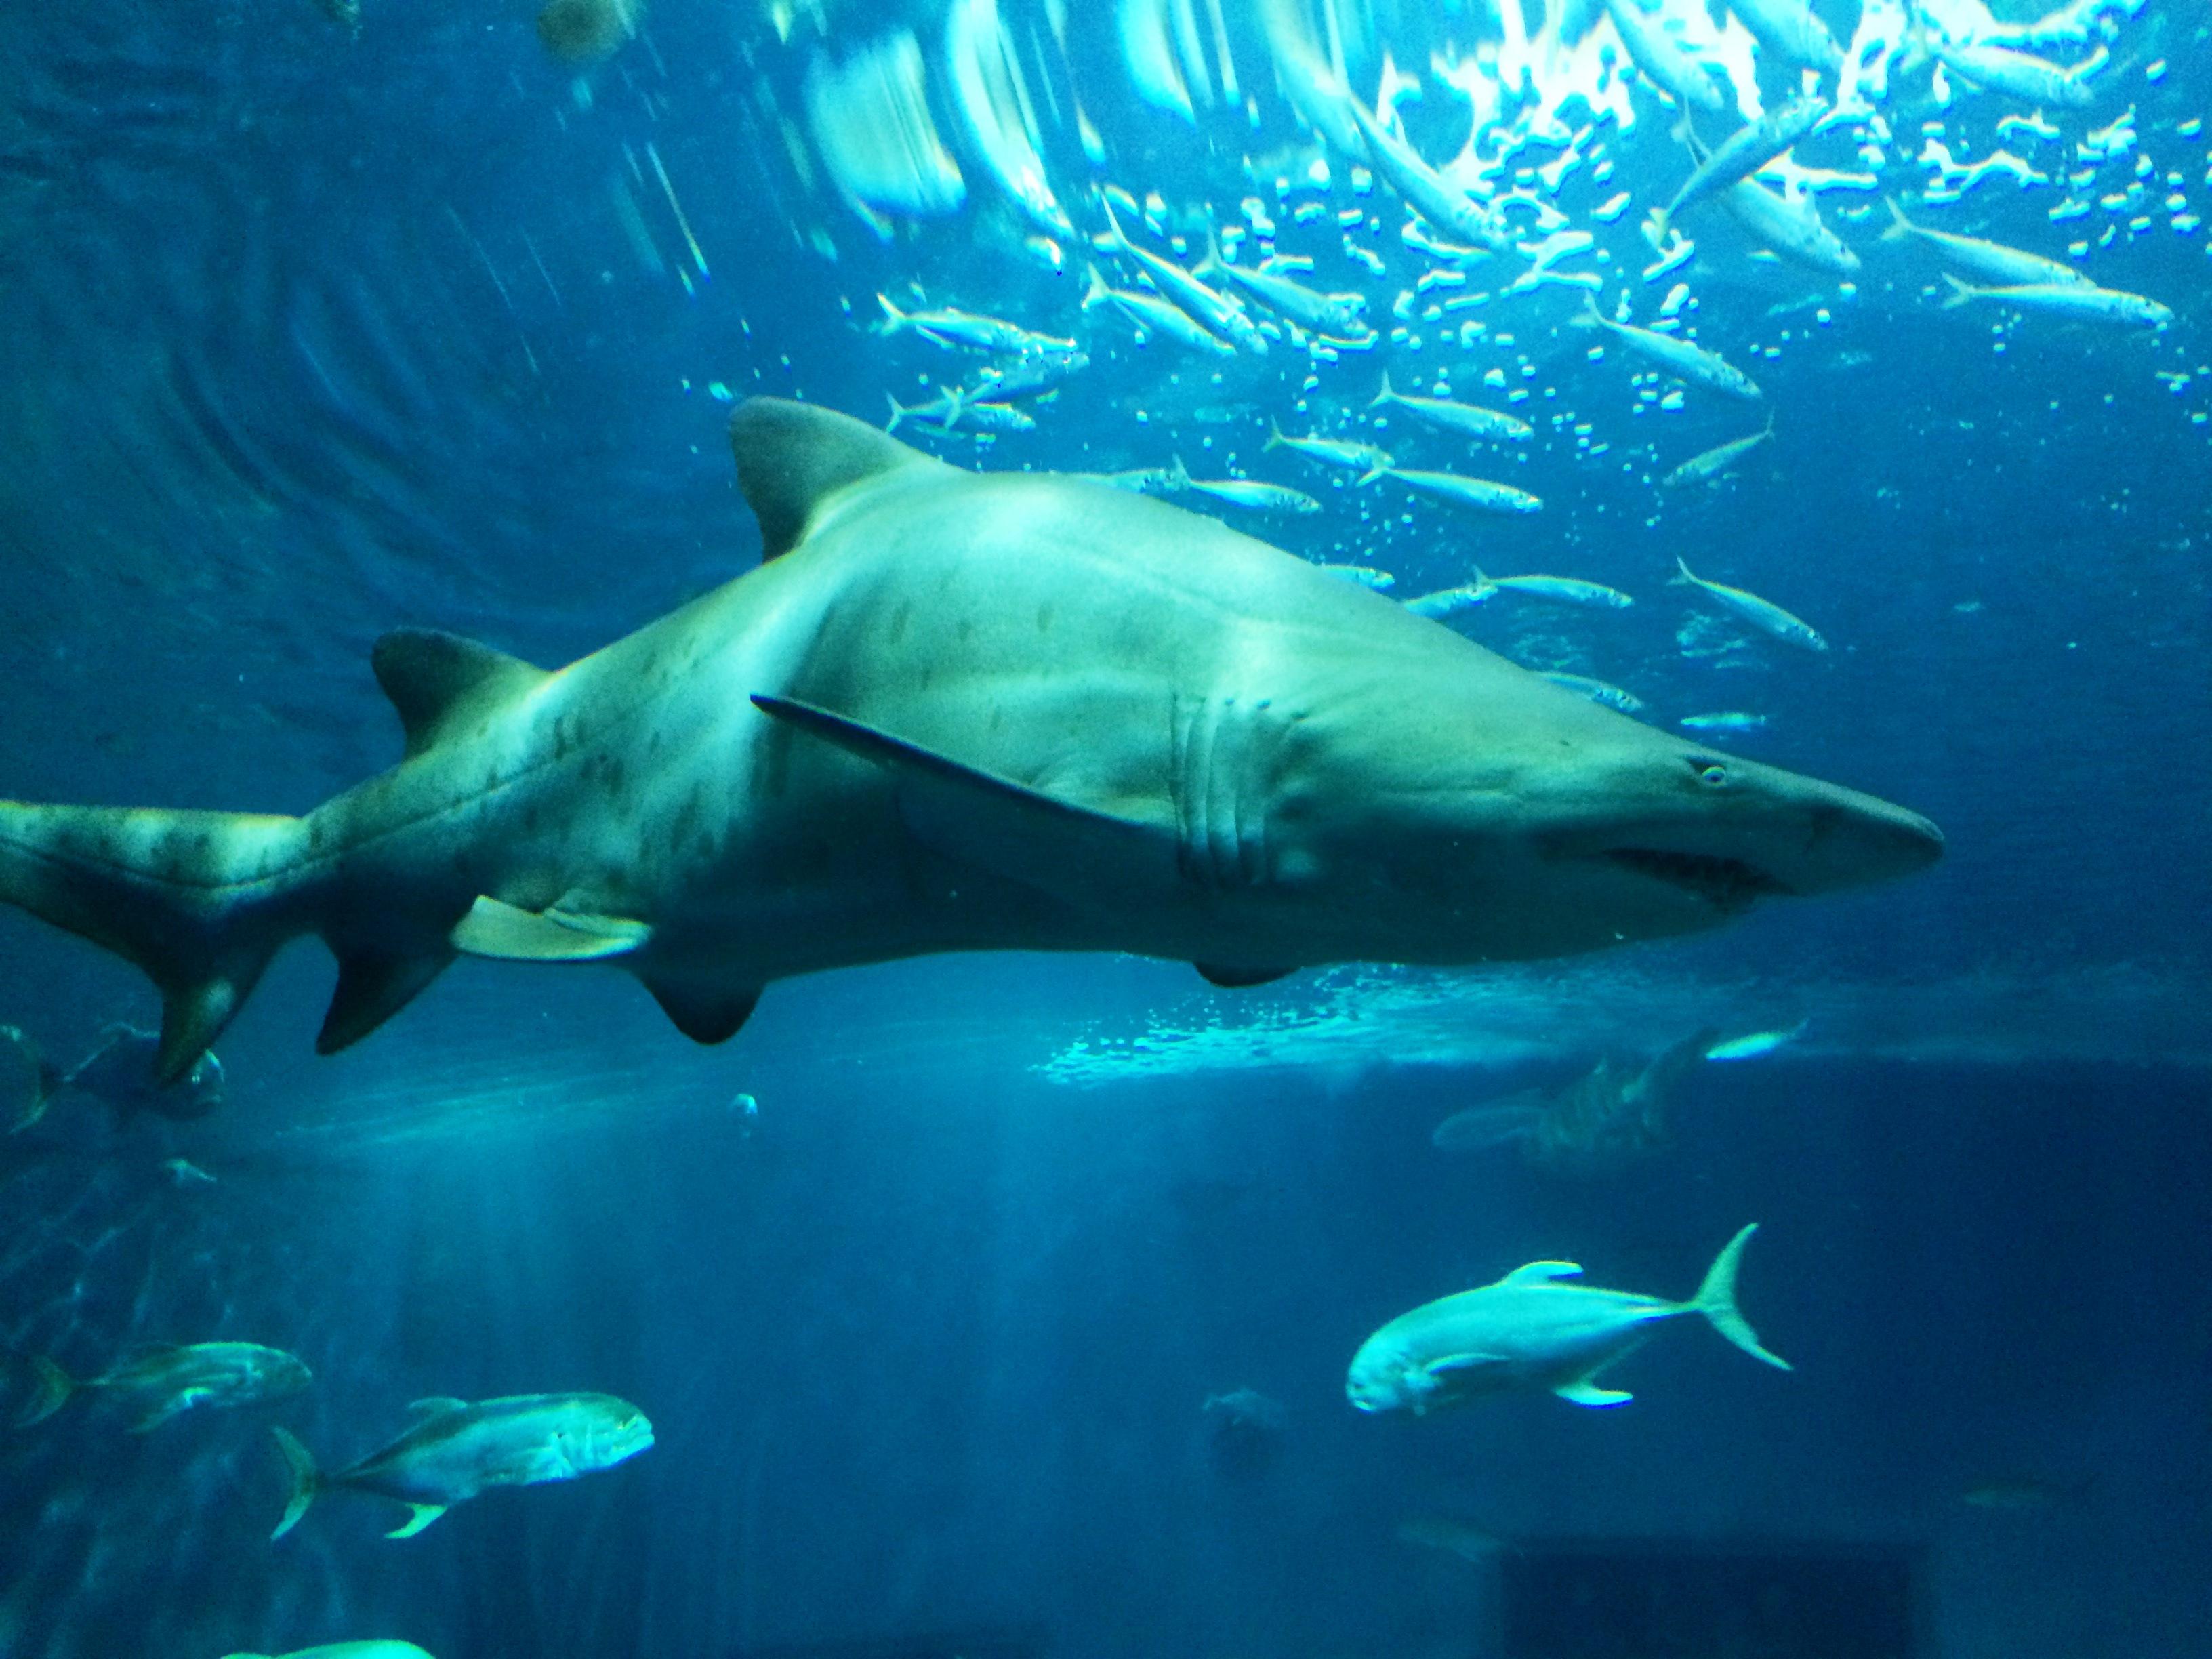 Fileacuario Sevilla Tiburon Torojpg Wikimedia Commons